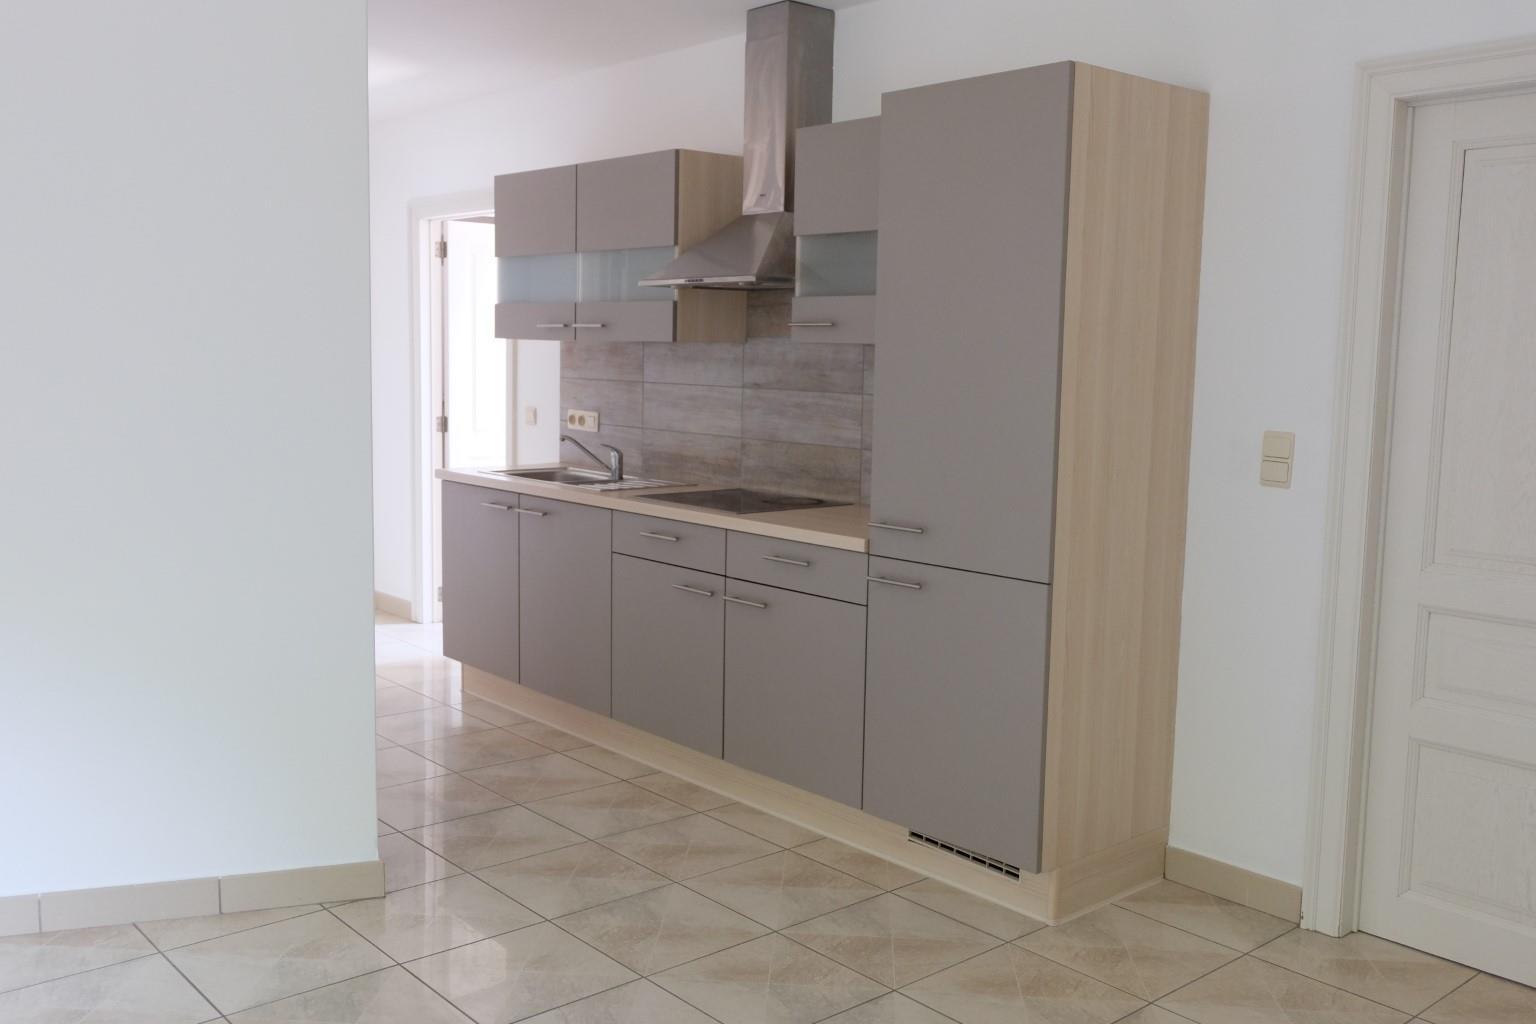 Appartement - Ittre Virginal-Samme - #2050724-5